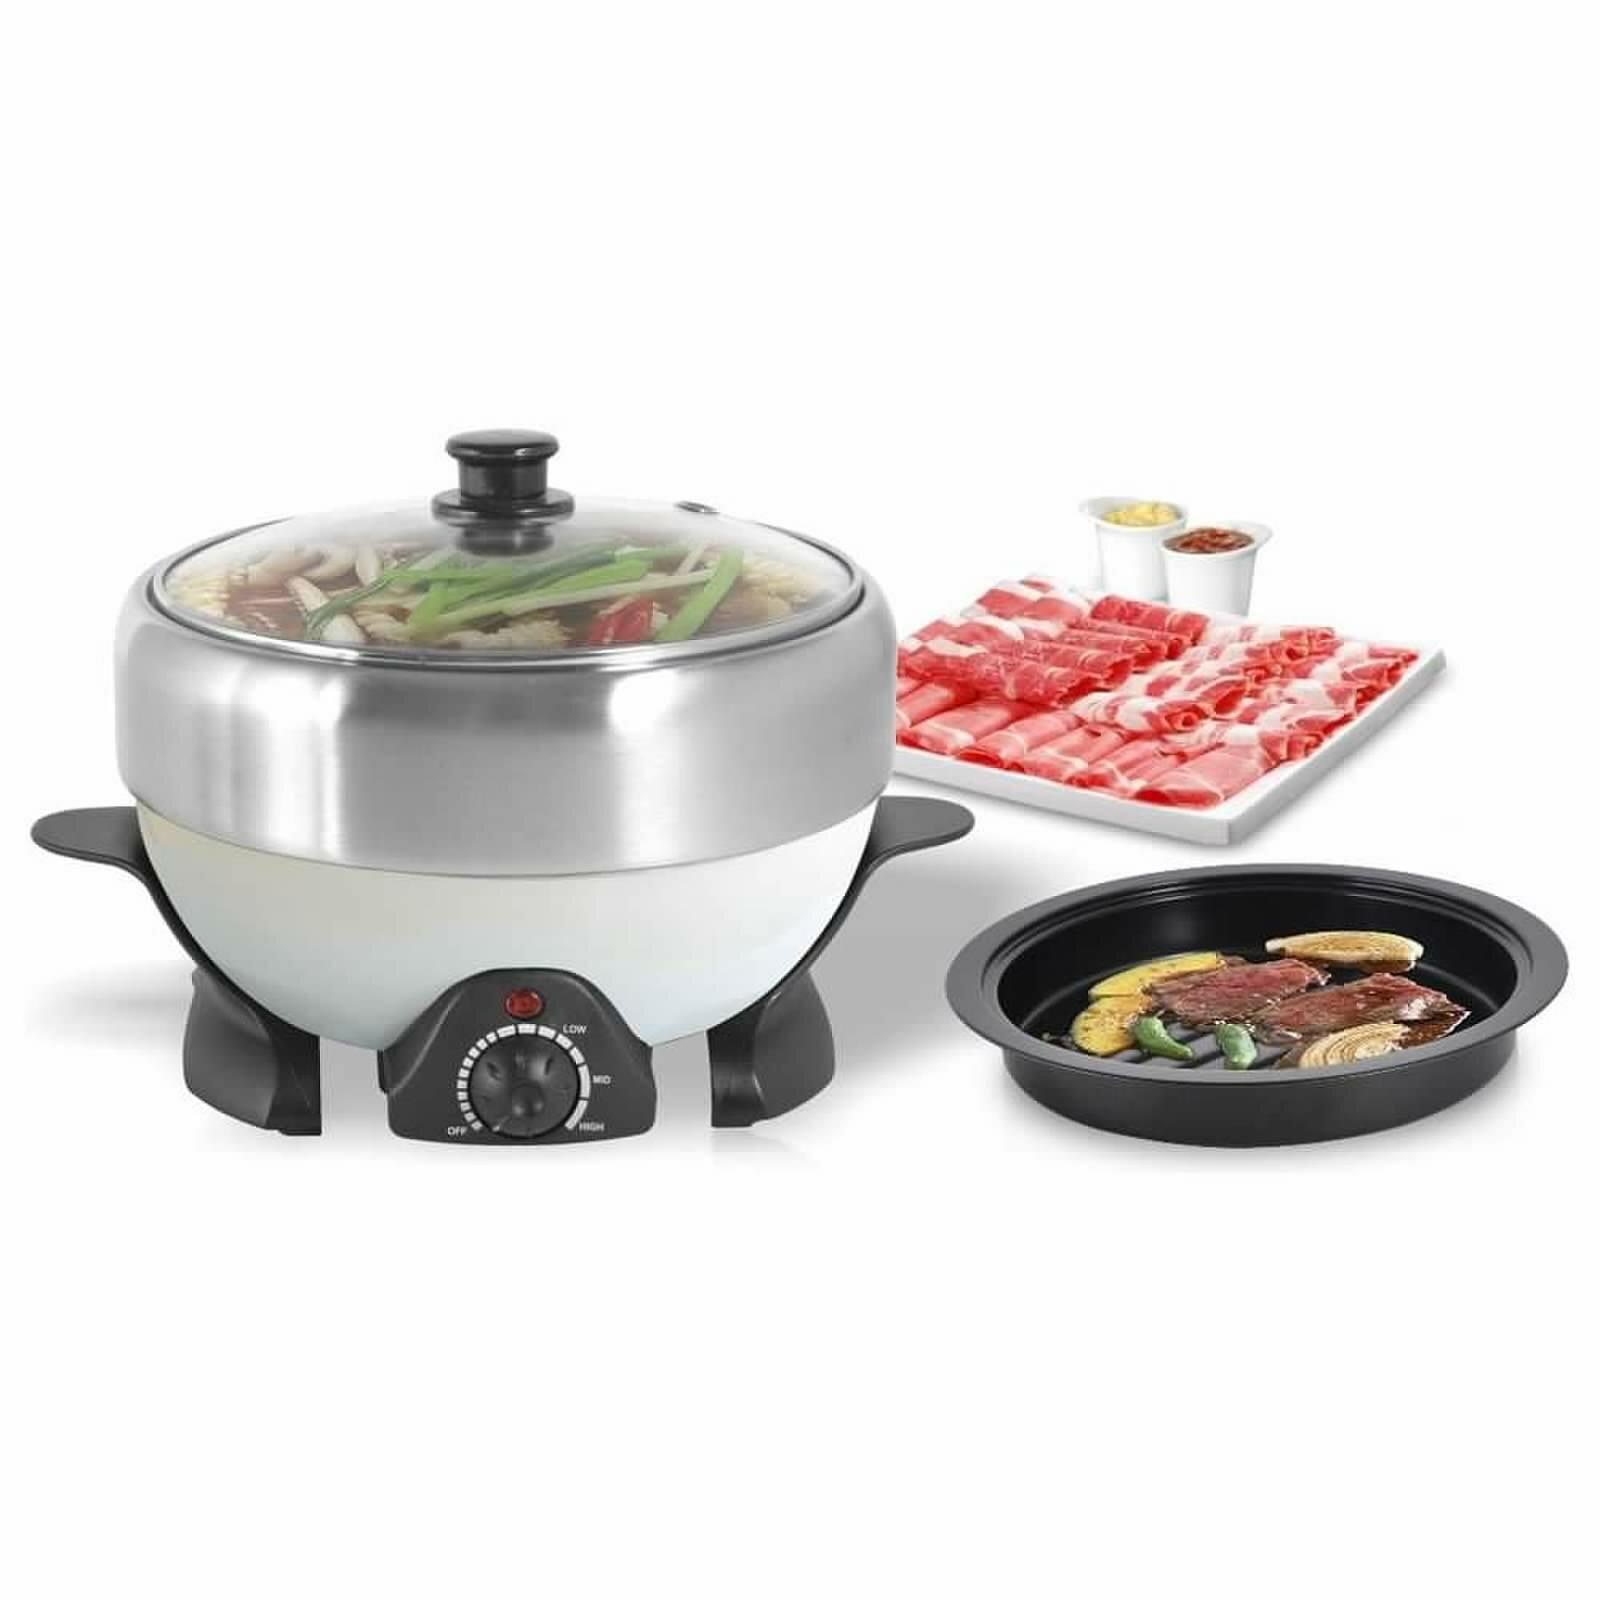 Narita 2 Qt Electric Stainless Steel Stew Cooker Wayfair